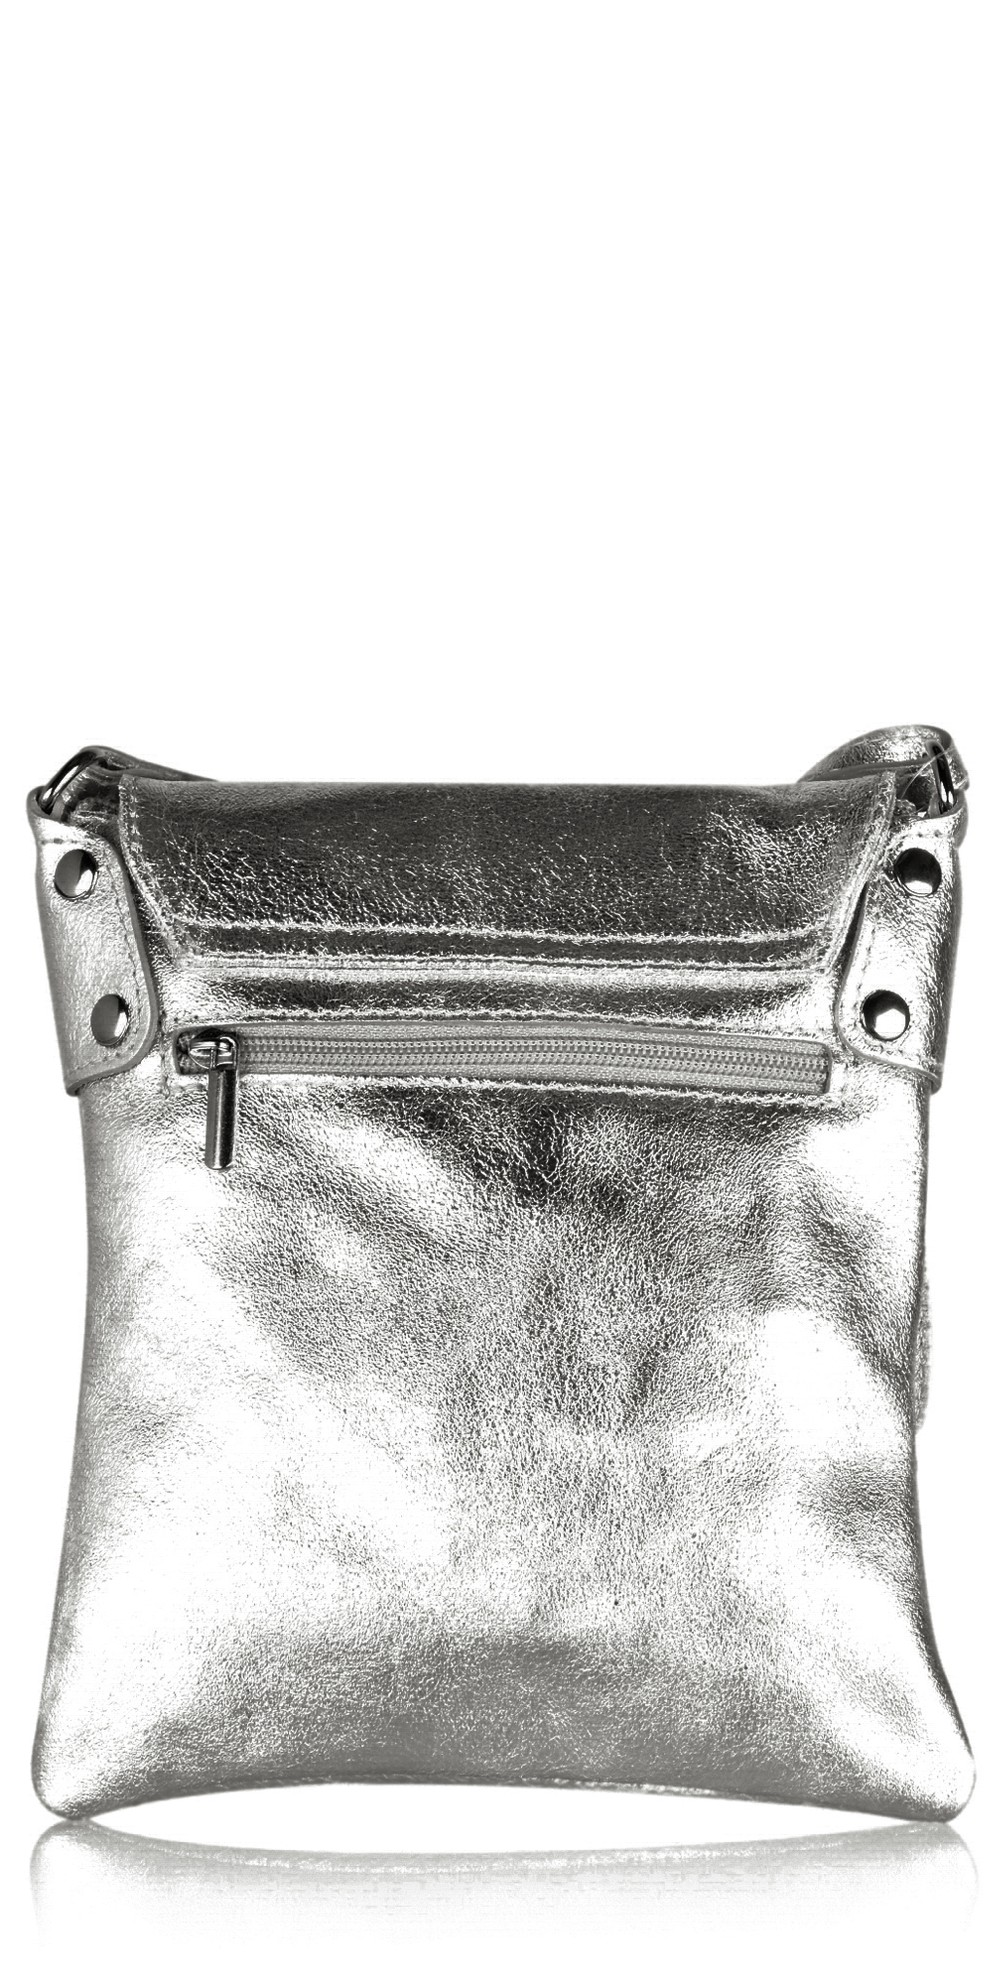 Paige Cross Body Bag main image